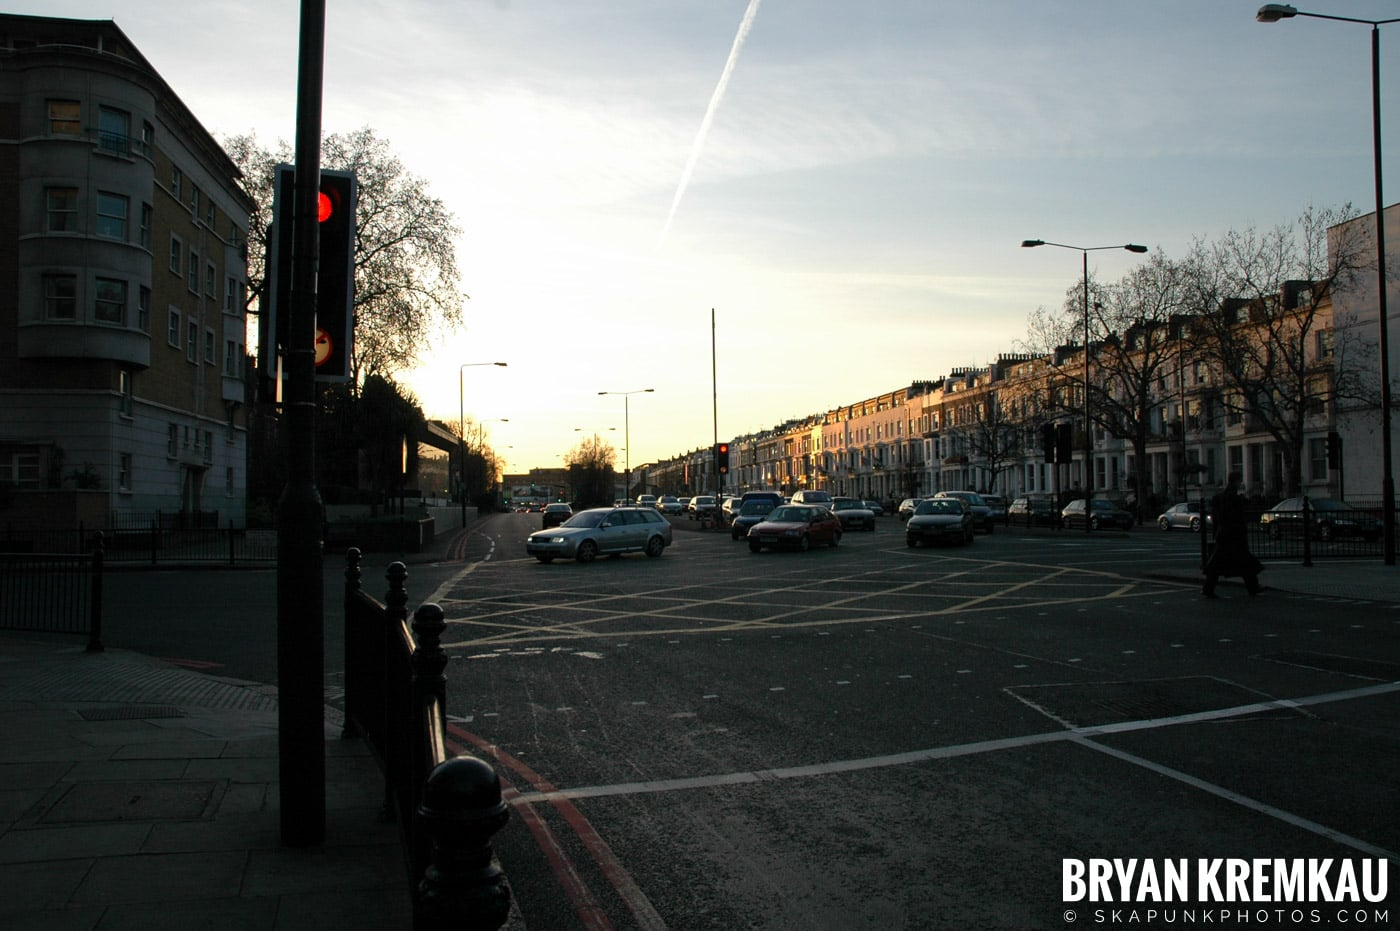 London, England - Day 2 - 12.17.05 (4)